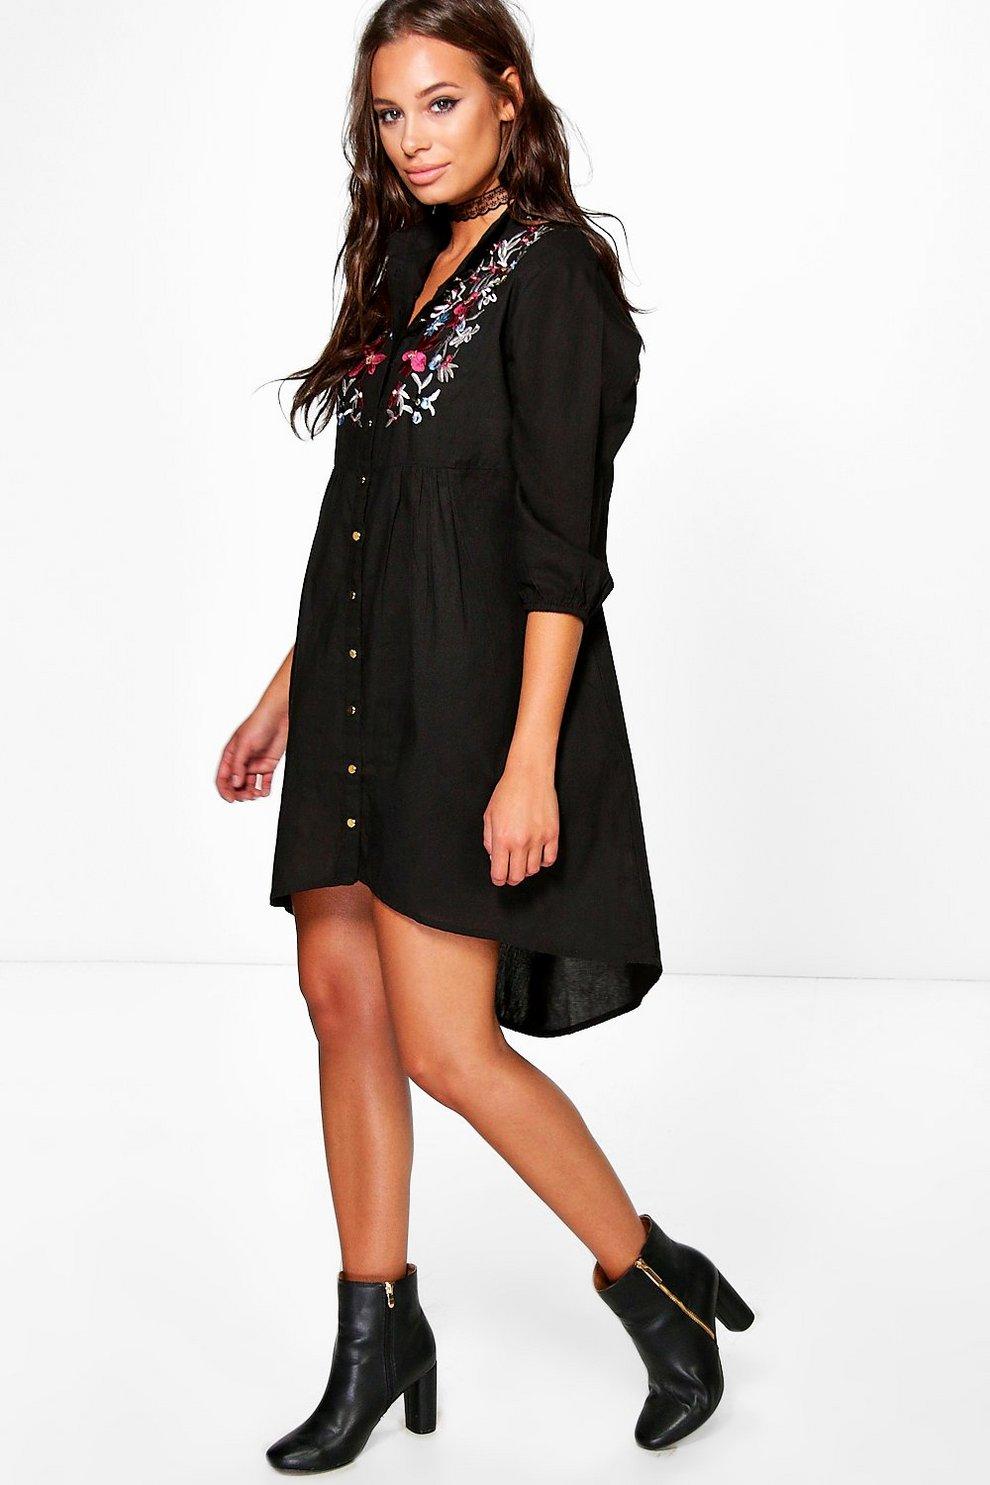 a57fe0596bc Ana robe chemise en Jean noire brodée